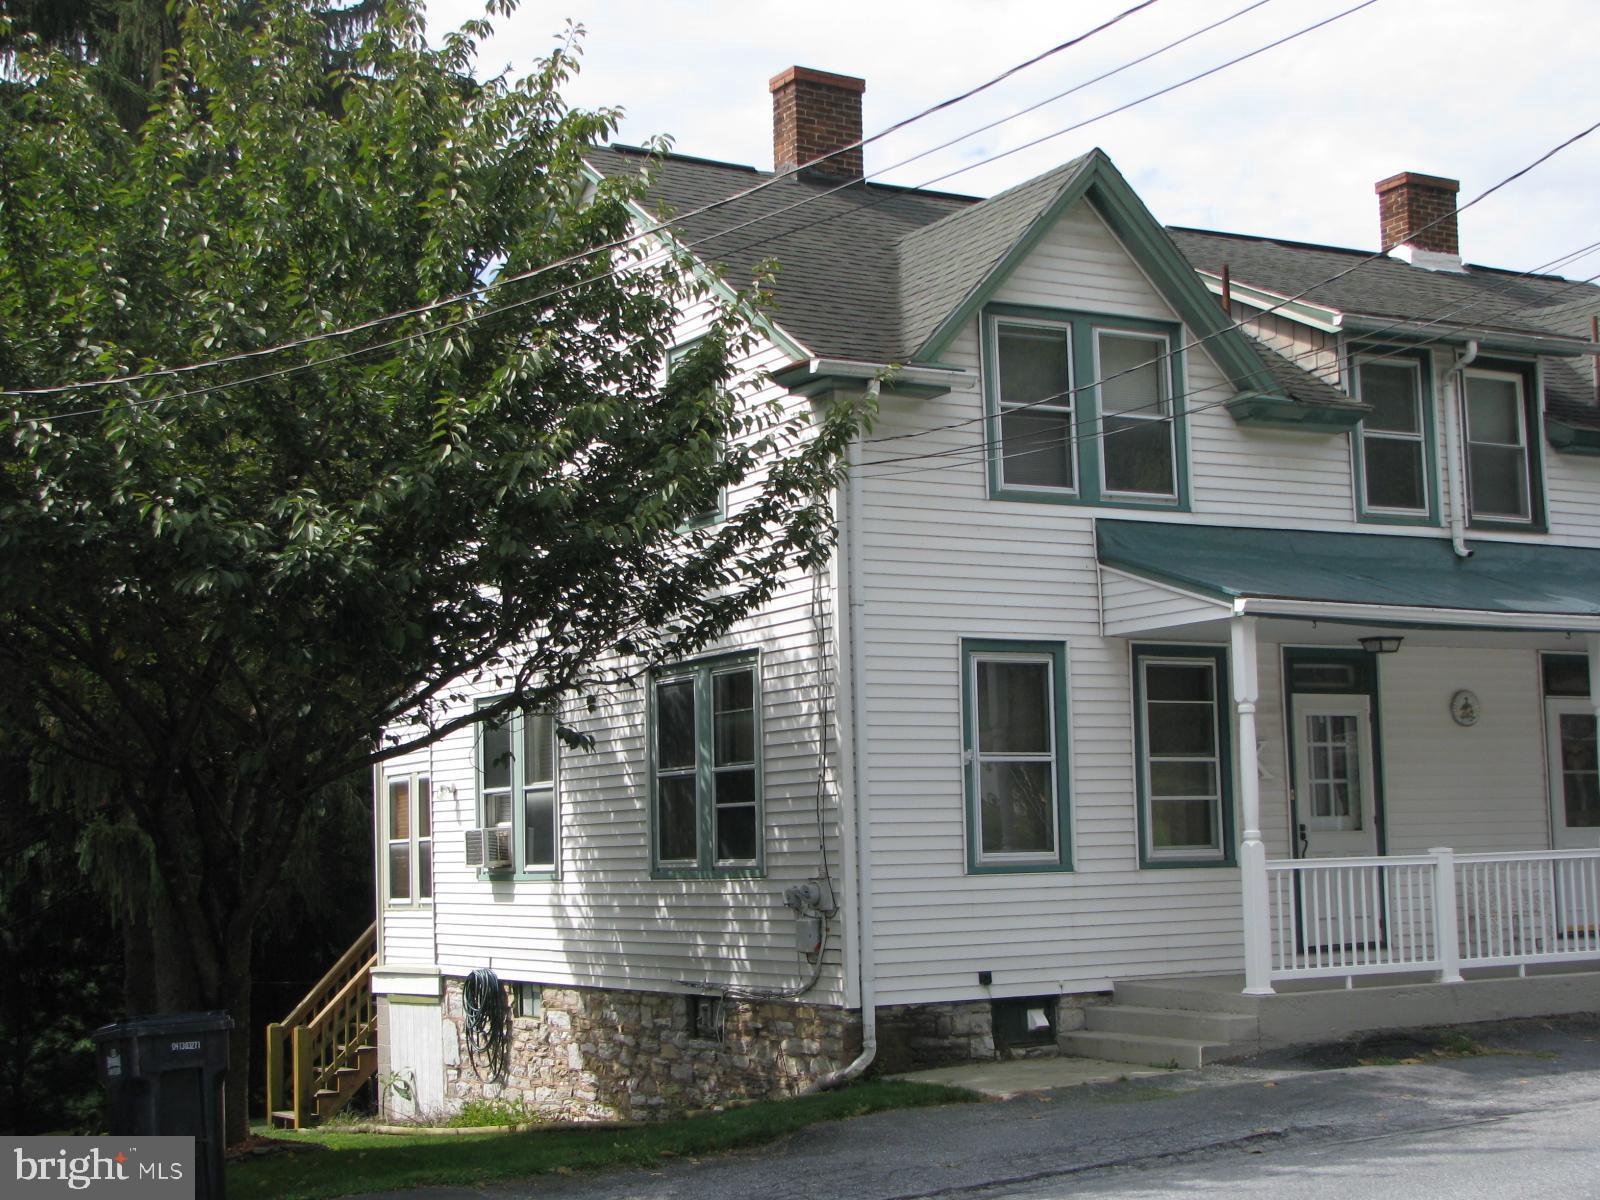 369 BOYD STREET, CORNWALL, PA 17016